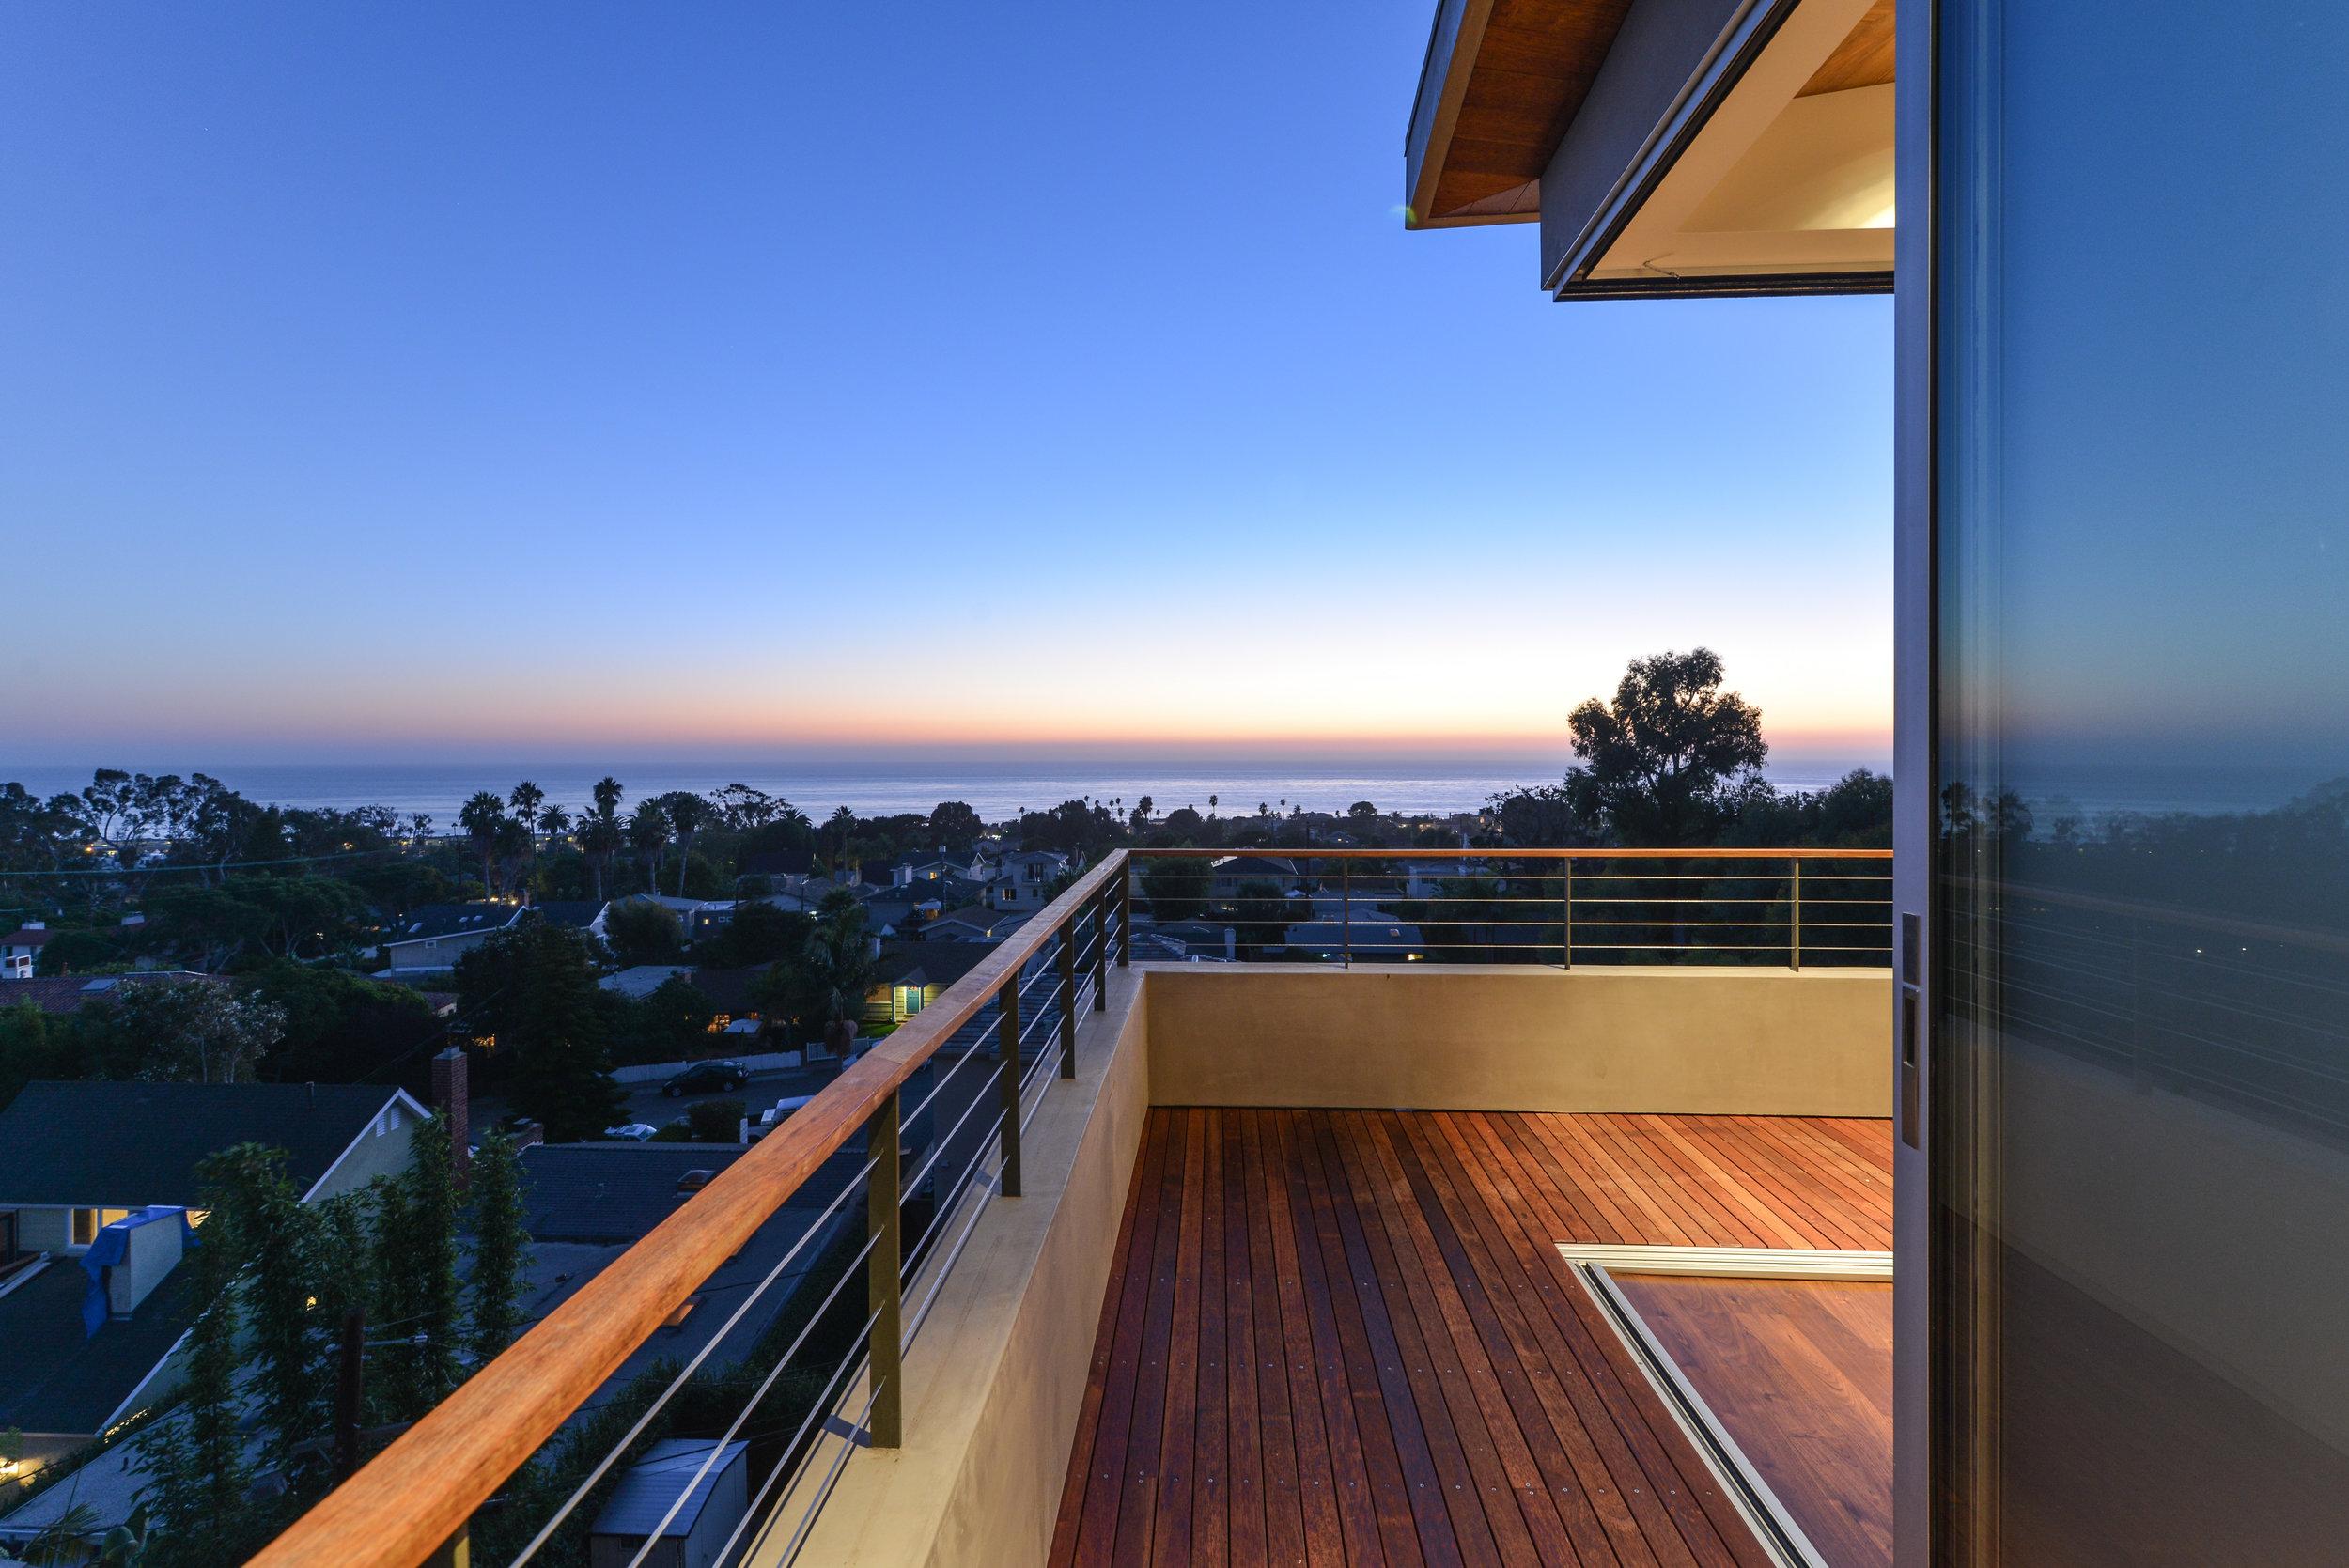 S.E.A.-Studio-Environmental-Architecture-David-Hertz-FAIA-Linda-Rosa-House-La-Jolla-San-Diego-sustainable-regenerative-restorative-design-modern-residential-mindful-garden-panoramic-ocean-view-open-concept-california-dream-3.jpg